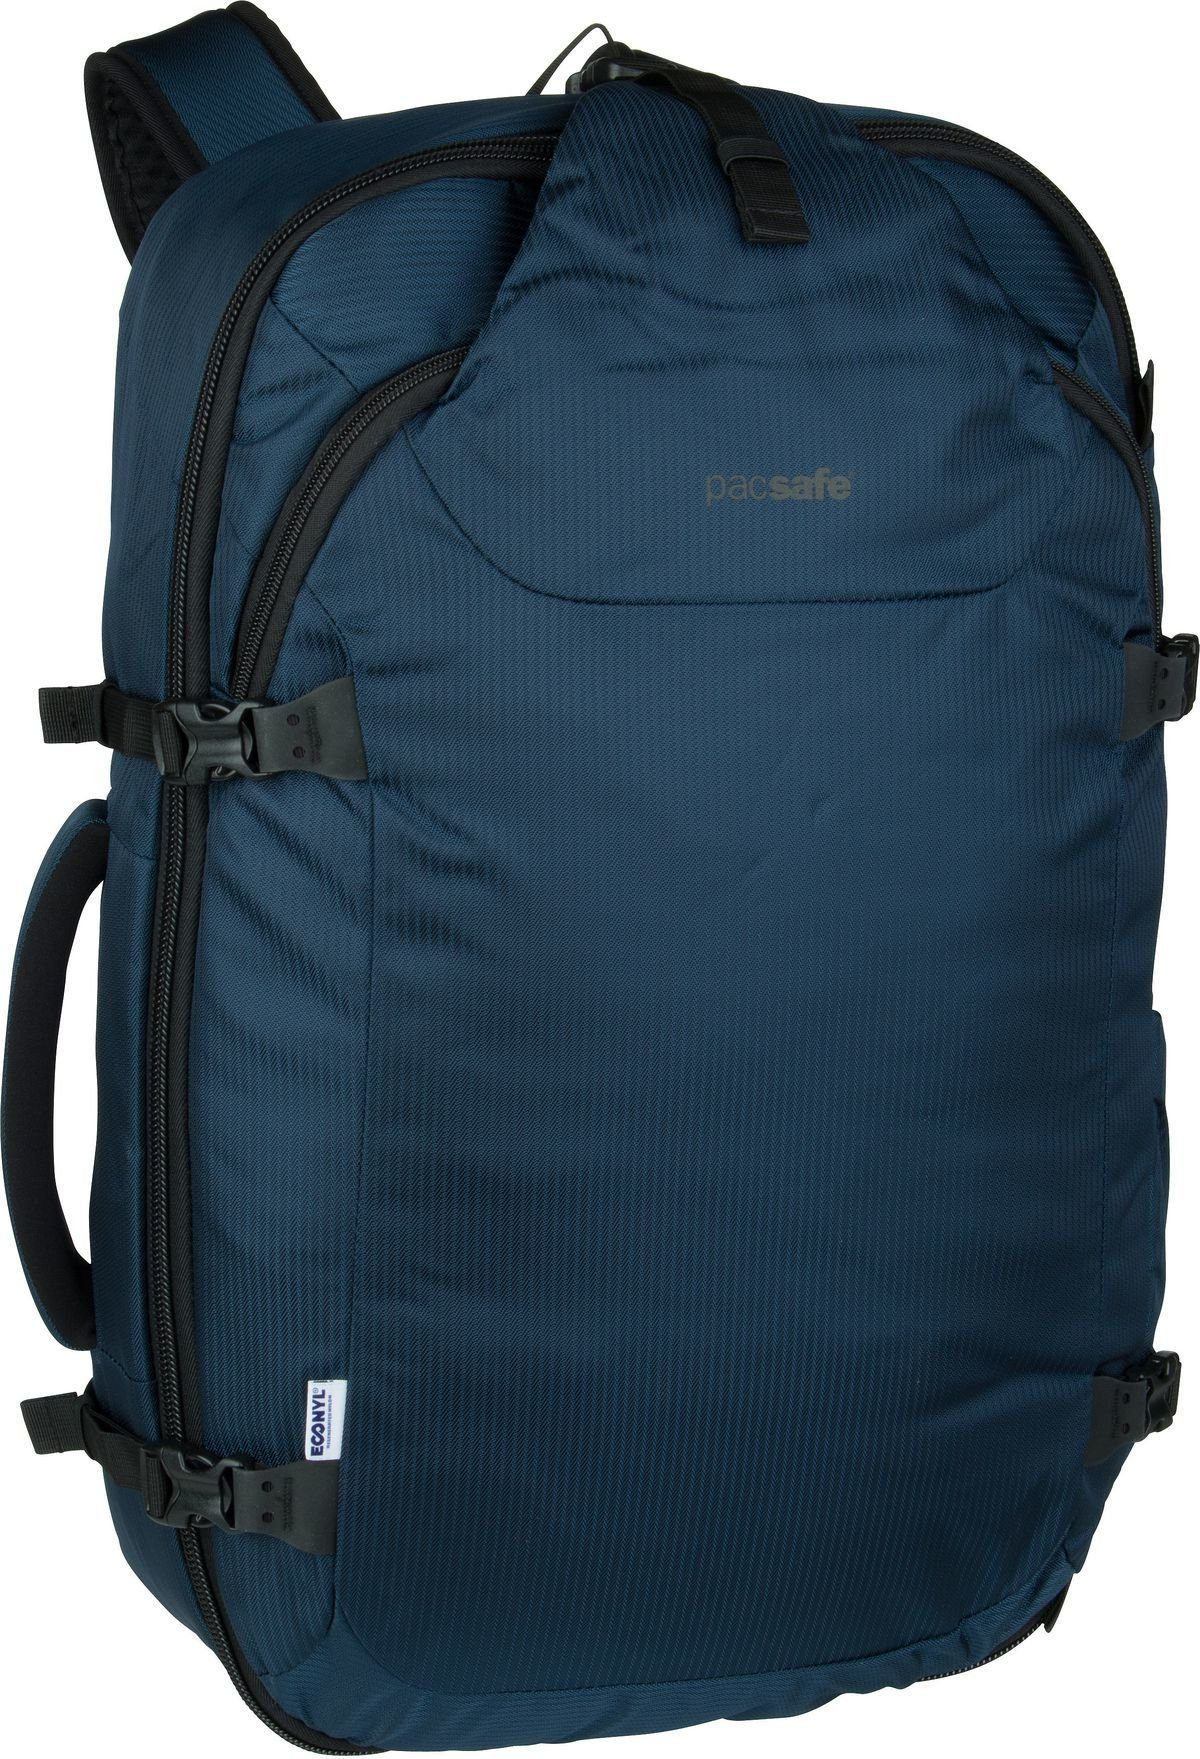 Unisex Pacsafe Rucksack / Daypack »Venturesafe EXP45 ECONYL« blau   00688334055608